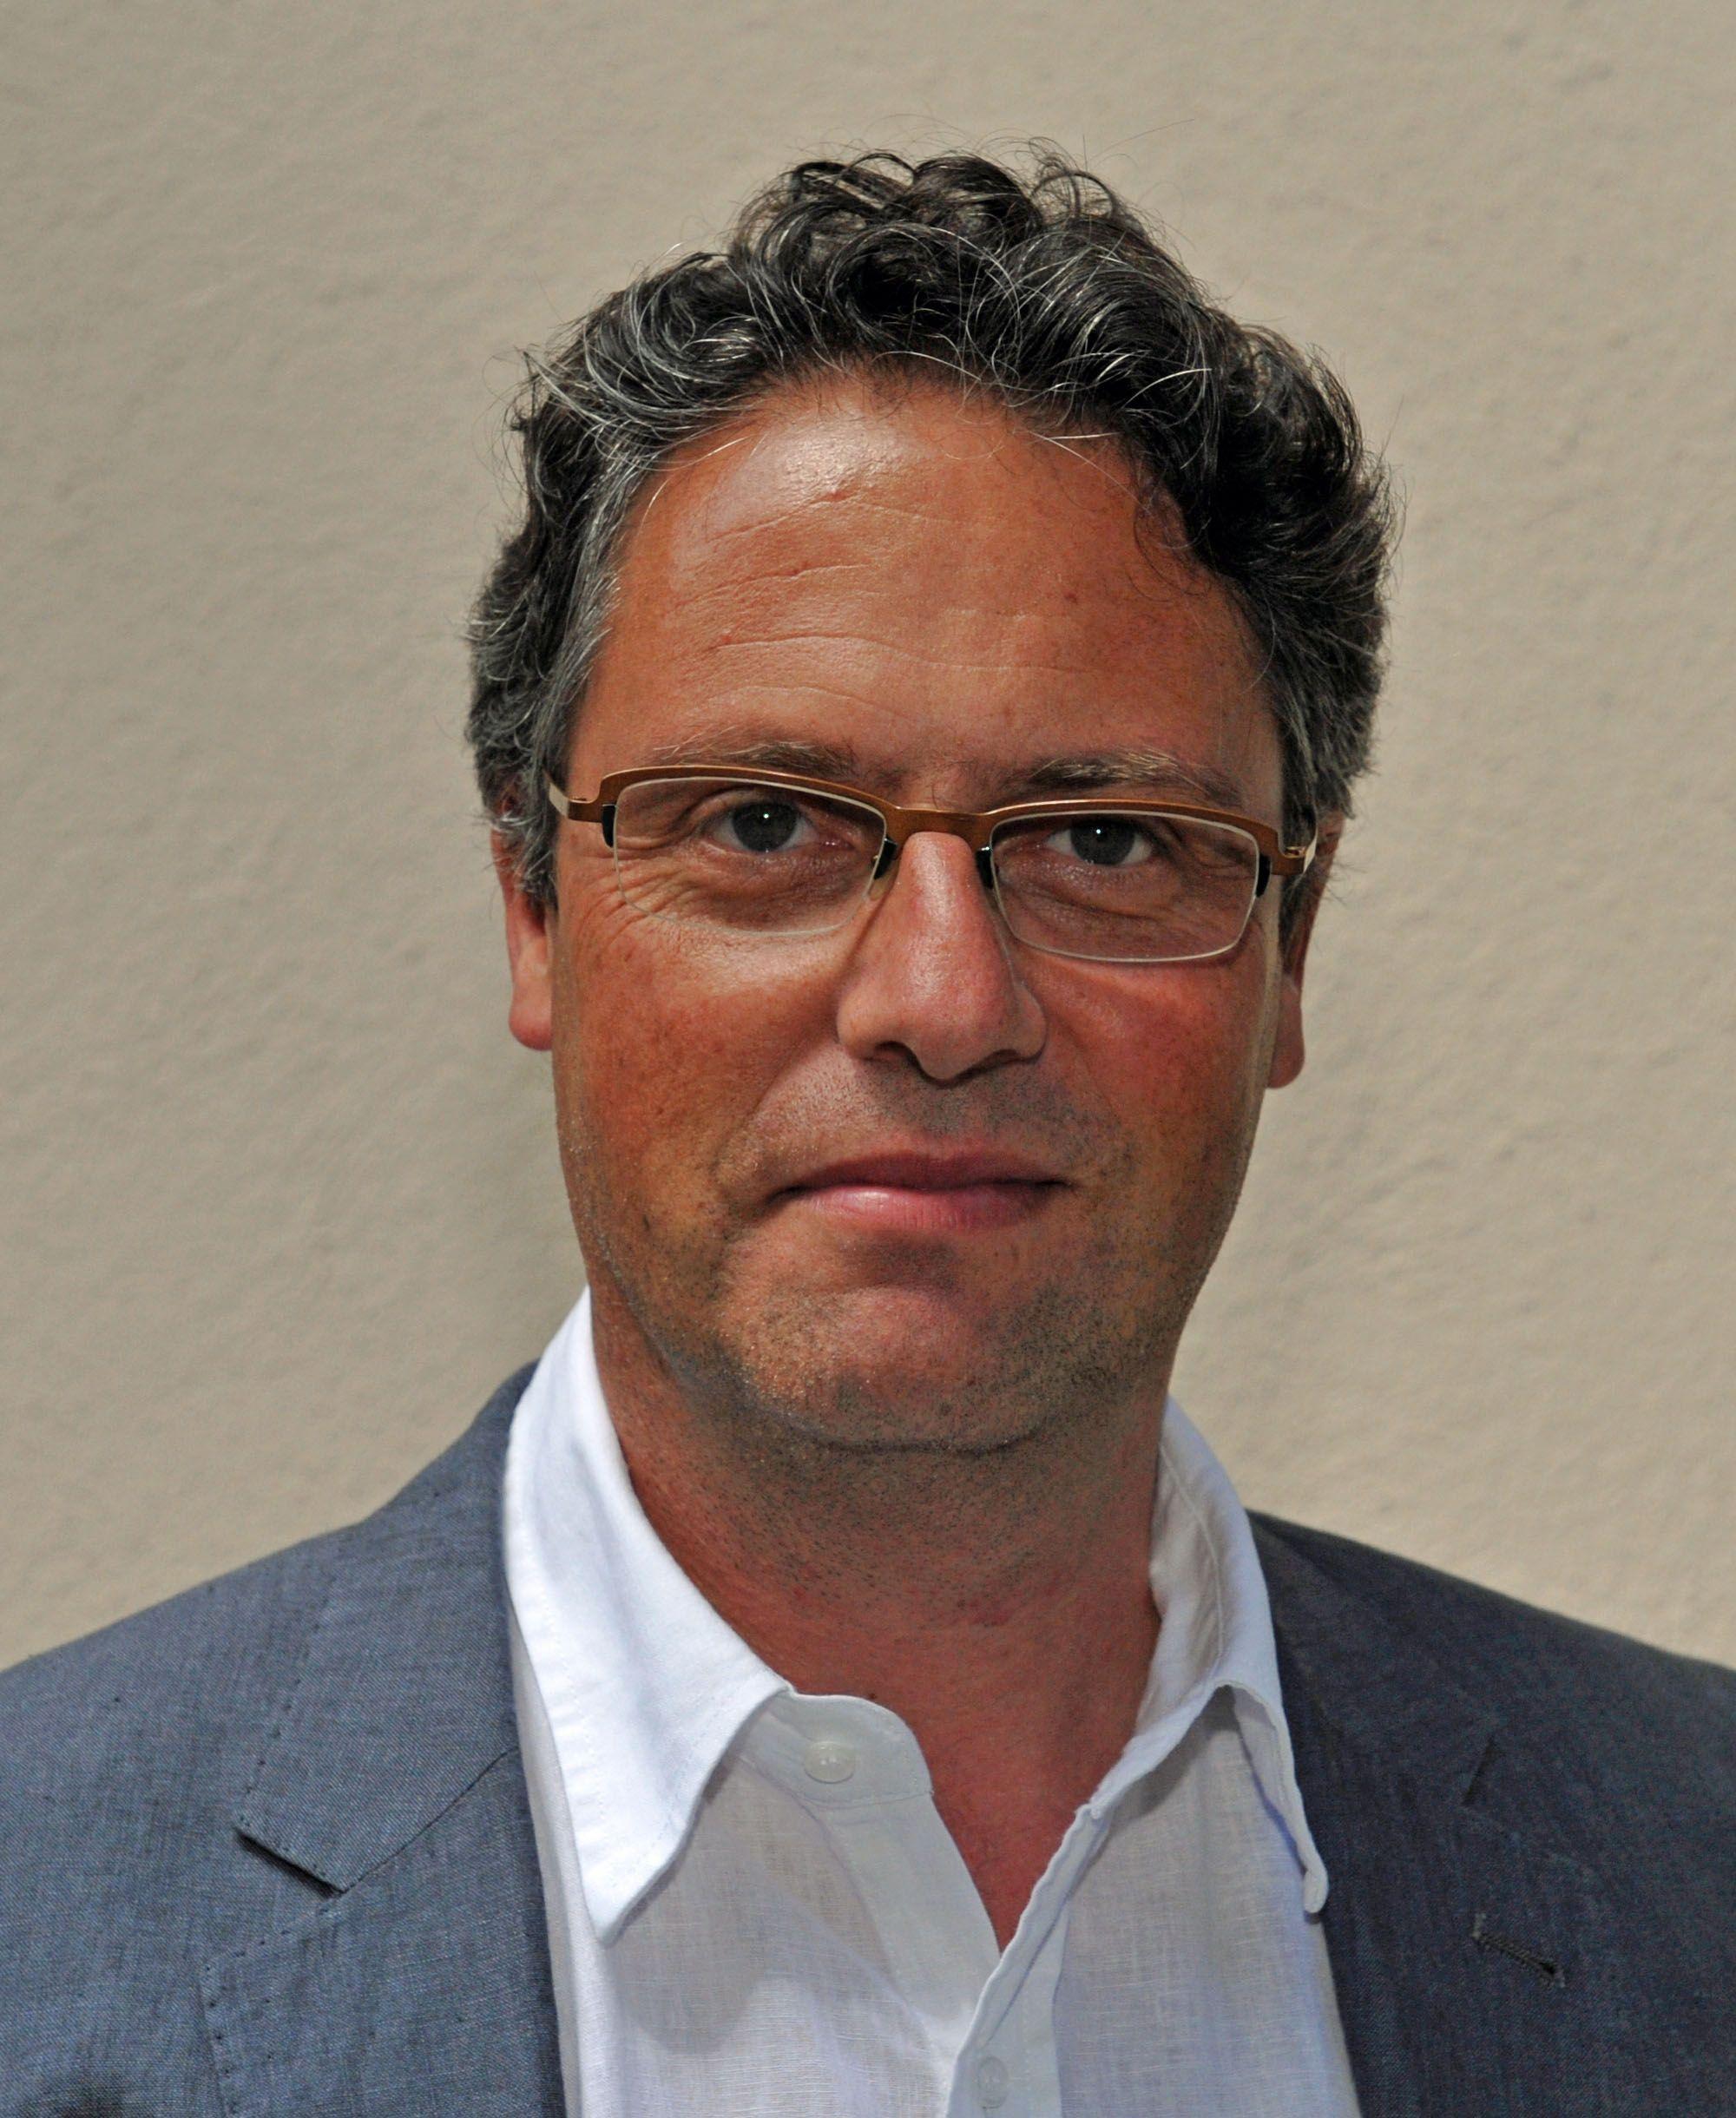 Zeno Steuri, Coach for Youth and Family, KJF Liestal Jugend social work, KinderKraftWerk, Switzerland